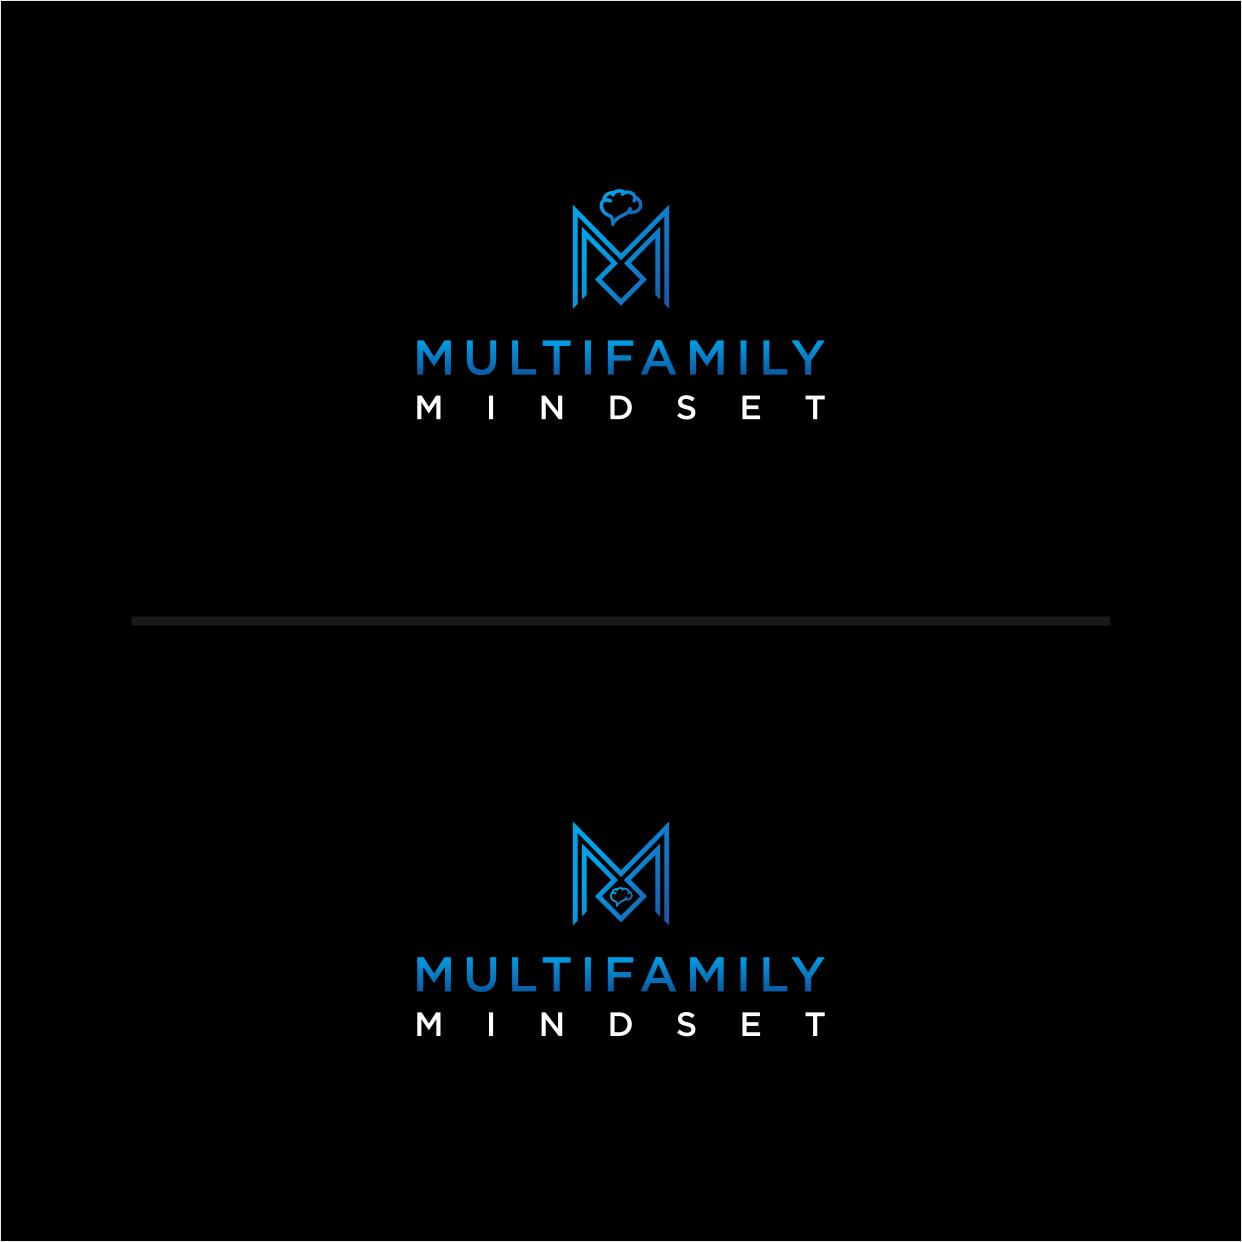 Design a wealth based logo for multifamily & mindset space